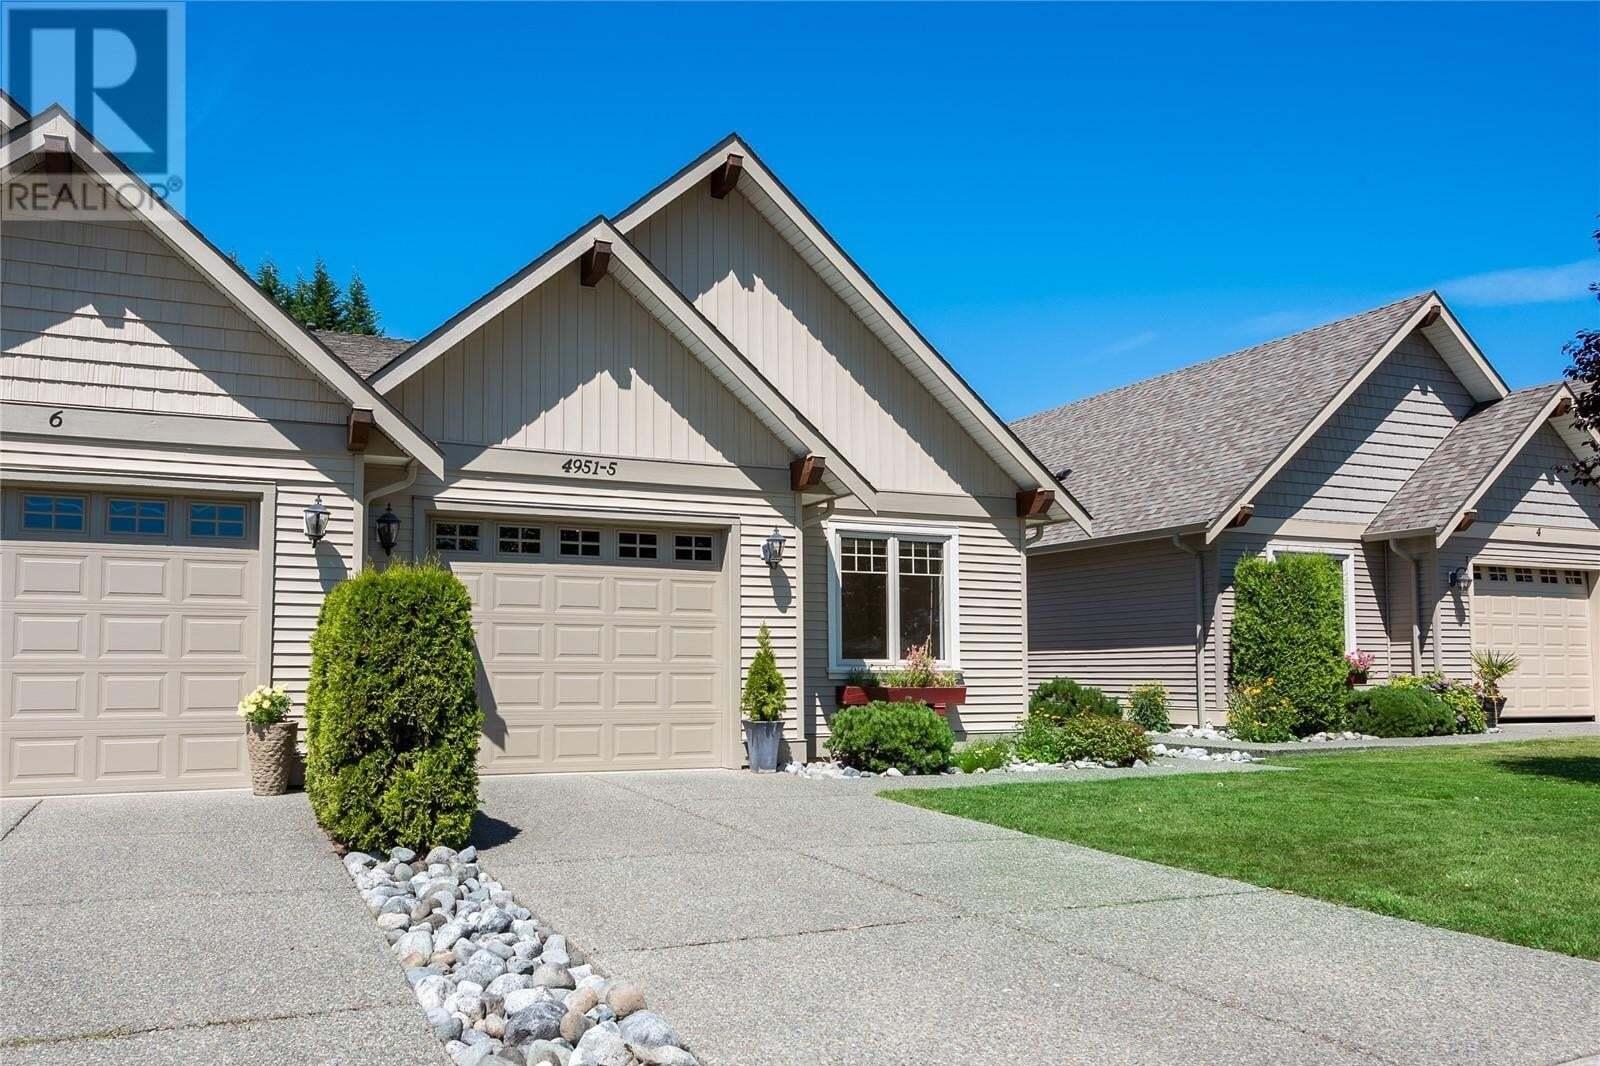 Townhouse for sale at 4951 Burke  Unit 5 Port Alberni British Columbia - MLS: 850545